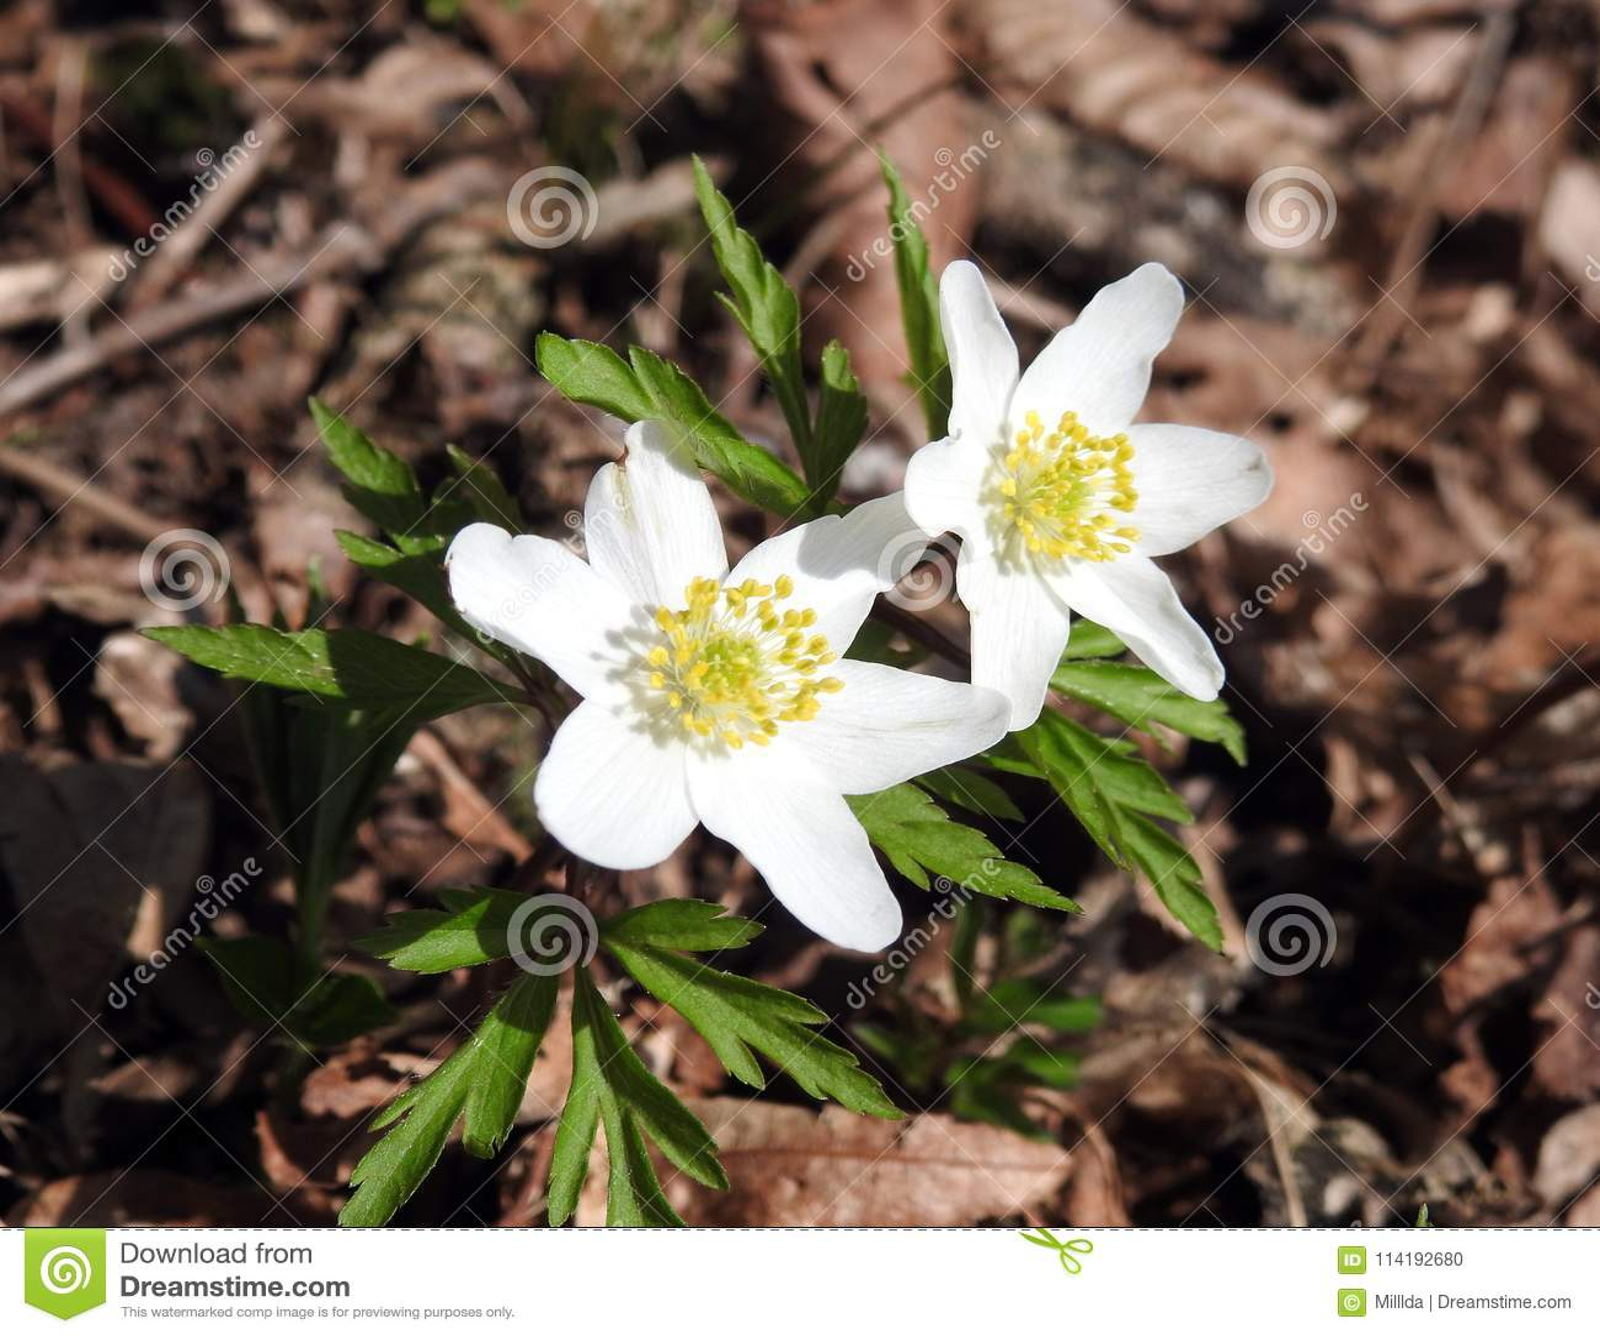 Beautiful white flower lithuania stock photo image of yellow download beautiful white flower lithuania stock photo image of yellow saffron 114192680 izmirmasajfo